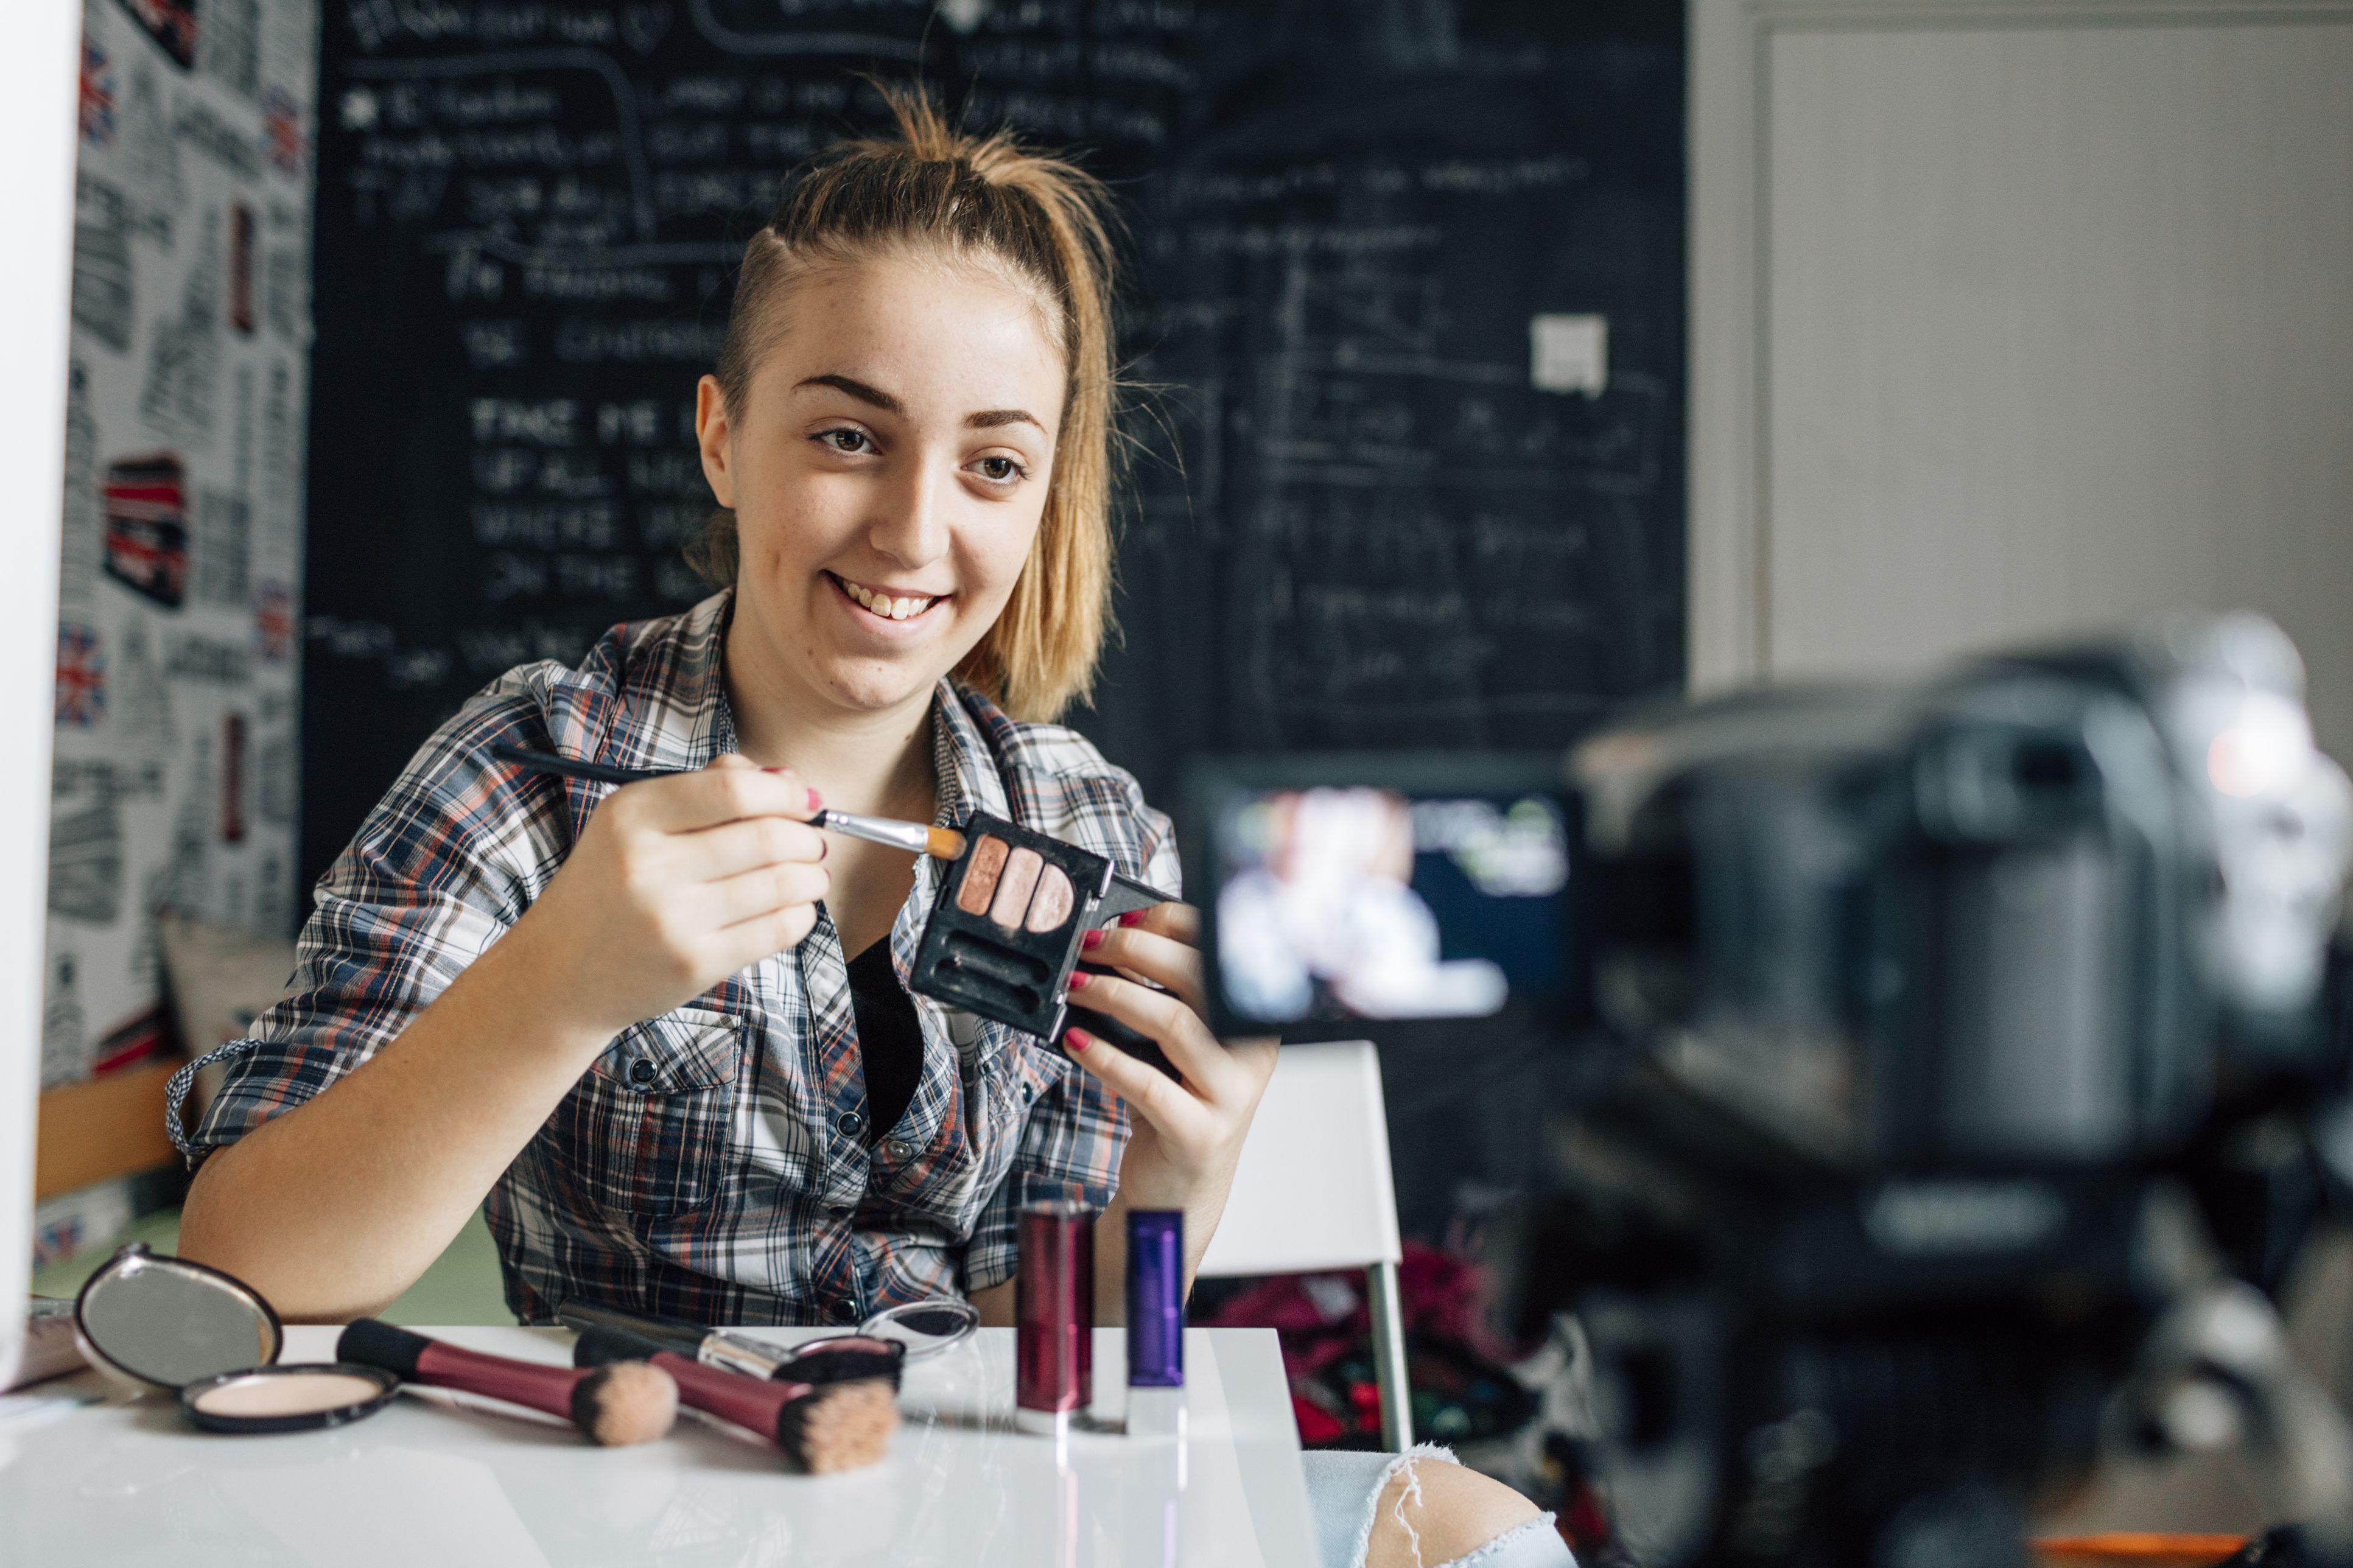 teenage-girl-making-her-video-blog-495252898-57c4a7ac3df78cc16eca0f8d